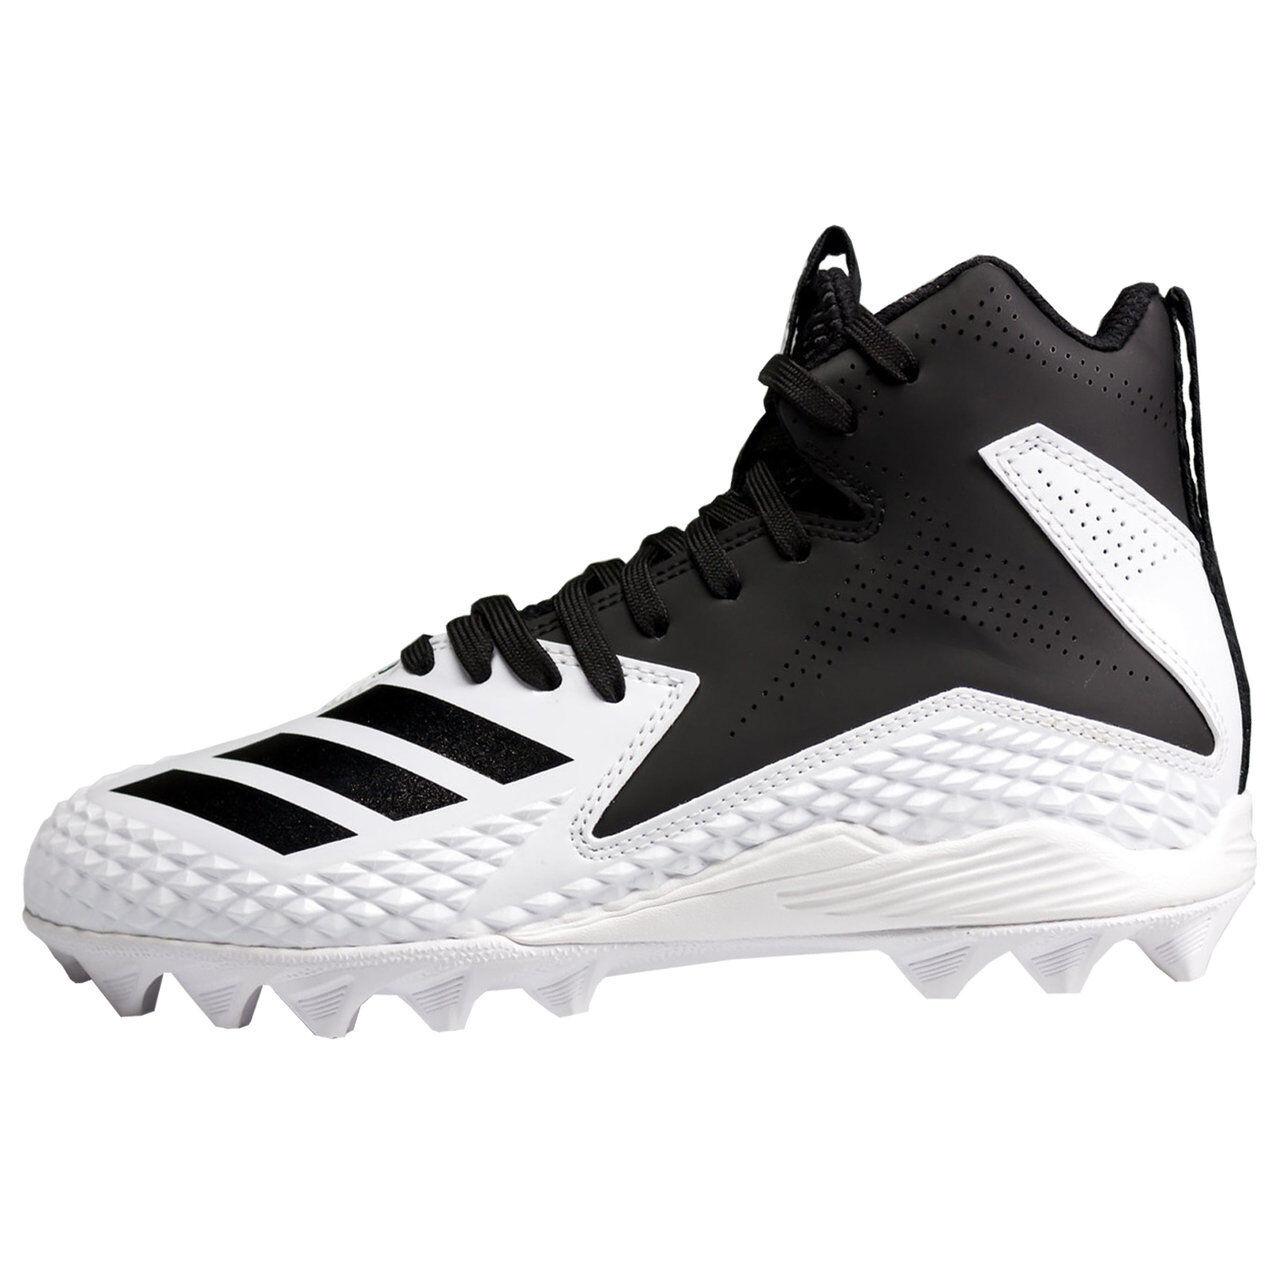 Adidas Freak Mid MD Ενηλίκων Ποδιές ποδοσφαίρου / Ξ»Ξ±ΞΊΟΟŒΟƒΟ†Ξ±ΞΉΟΞ±Ο' CG4442 (NEW) Λίστα @ $ 60